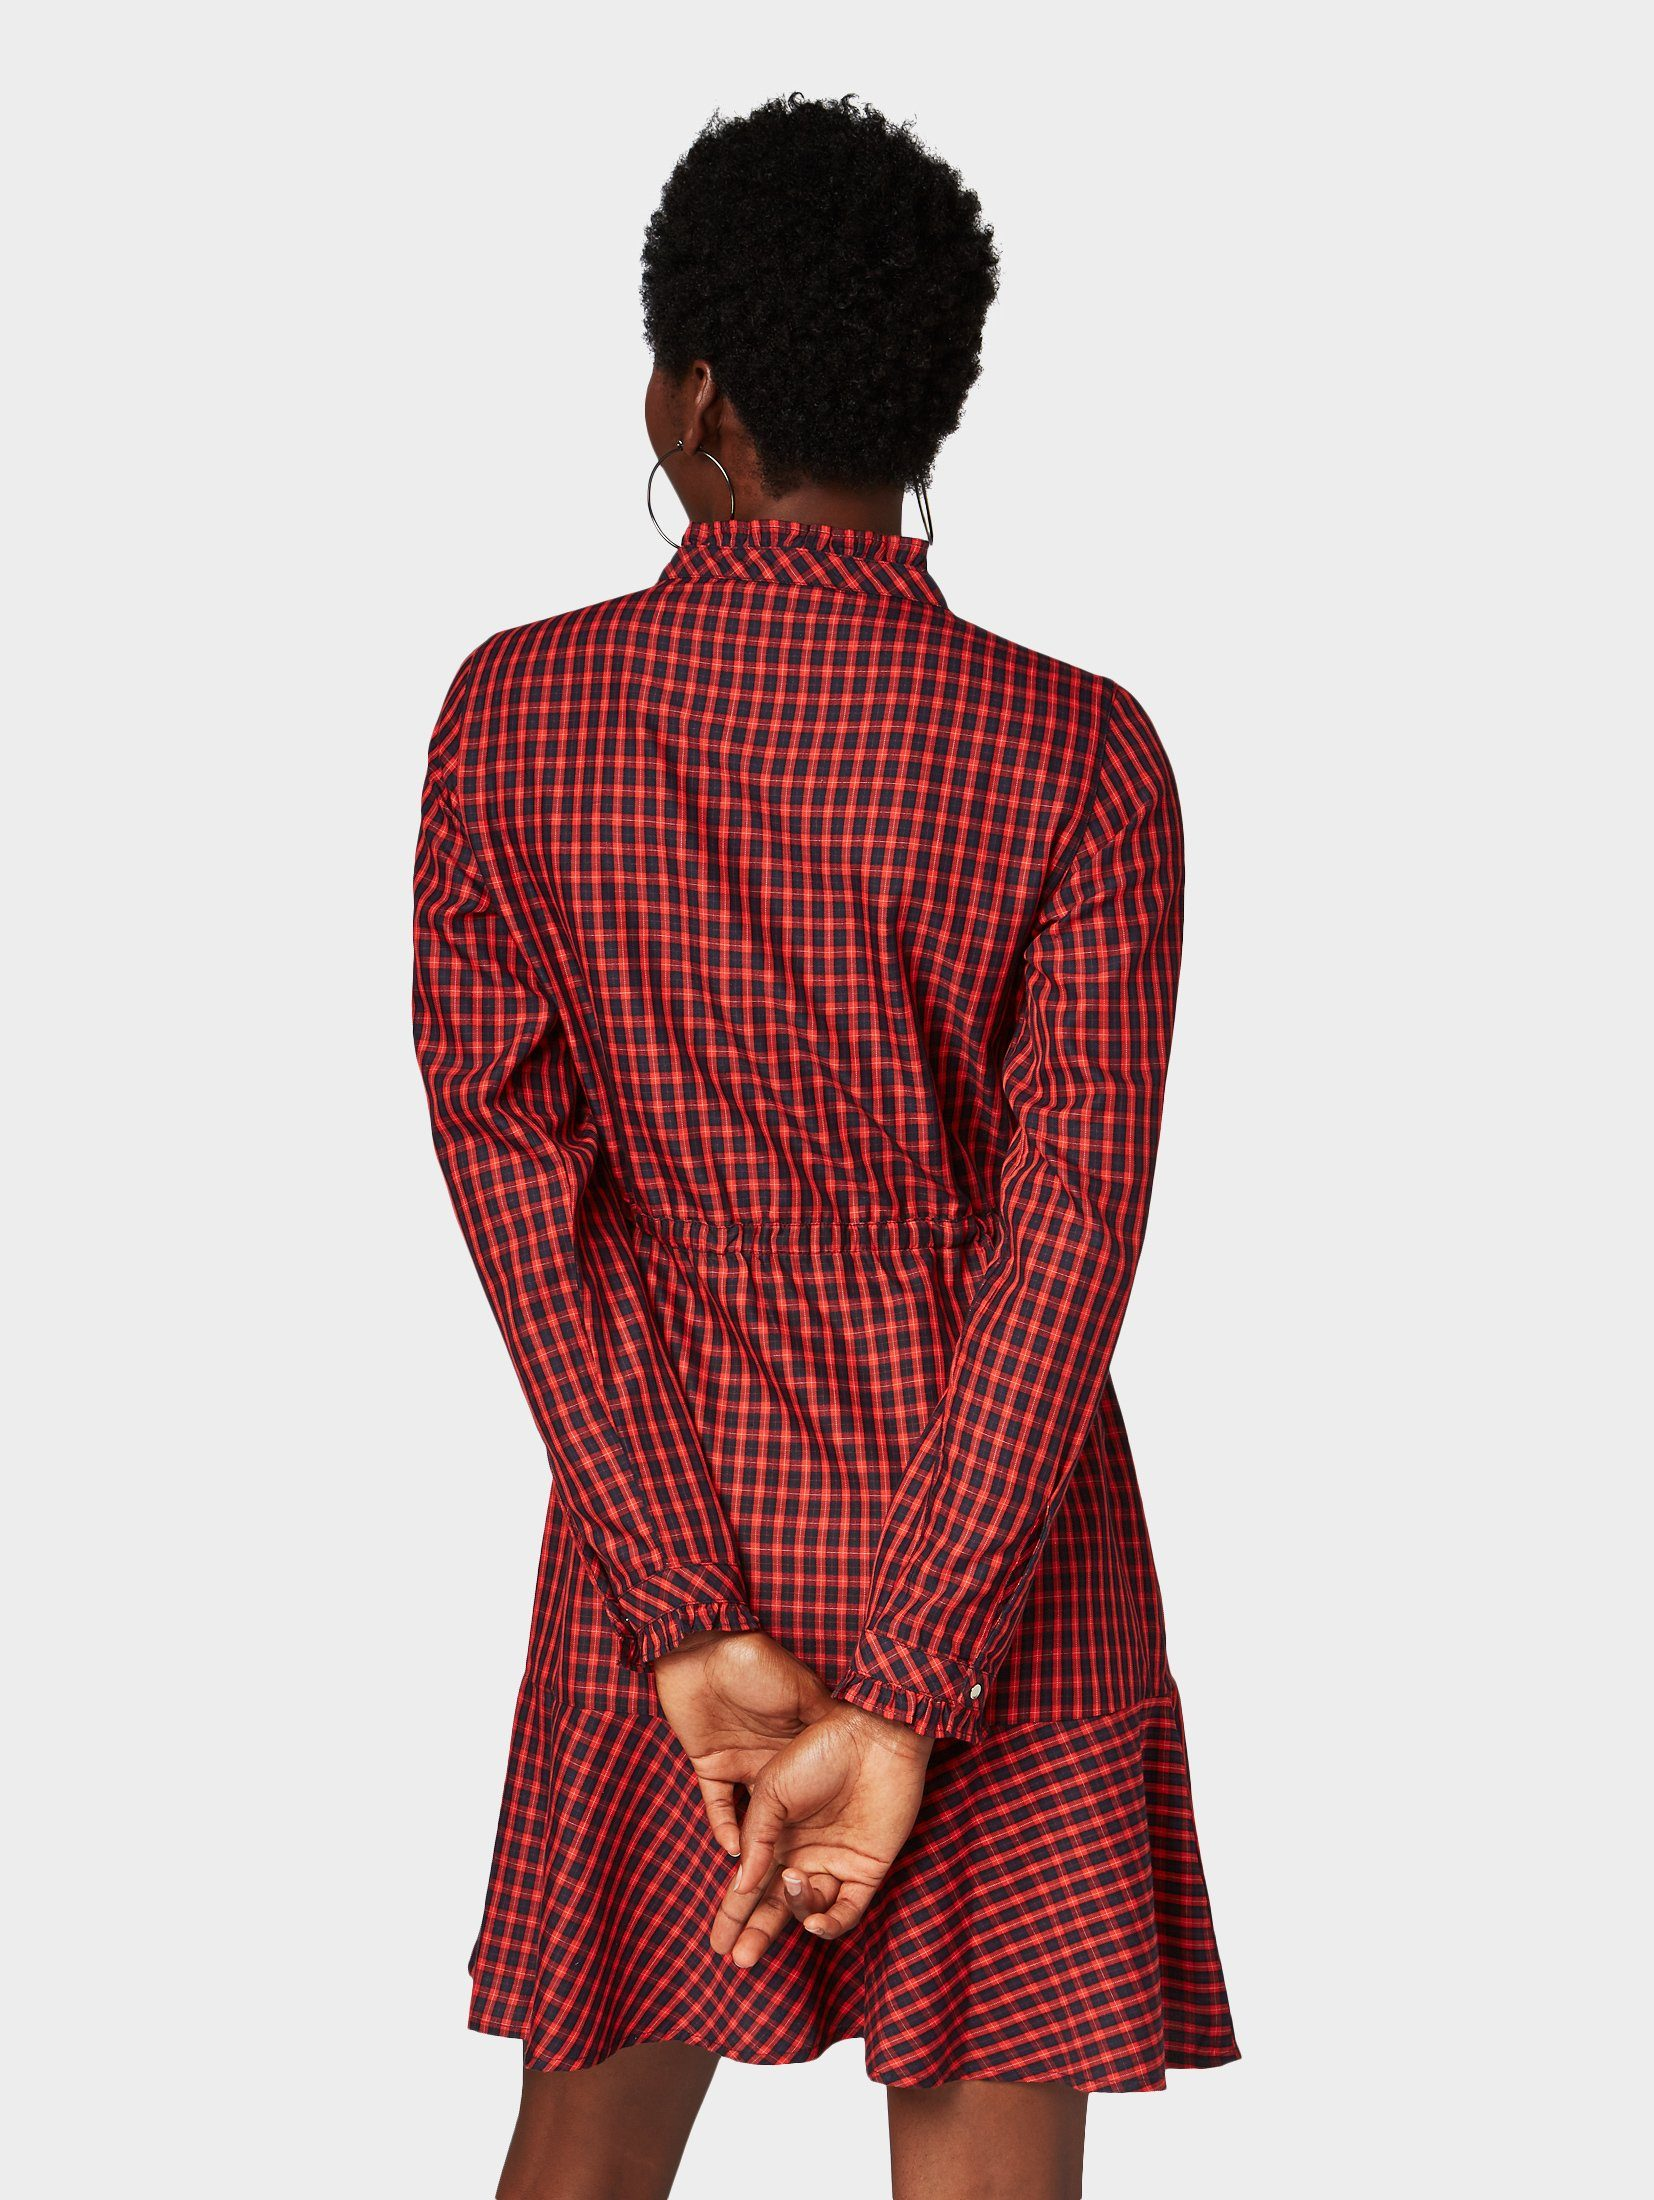 Tom Karokleid Tailor »kleid Denim Karomuster« Mit 9EHY2WDI